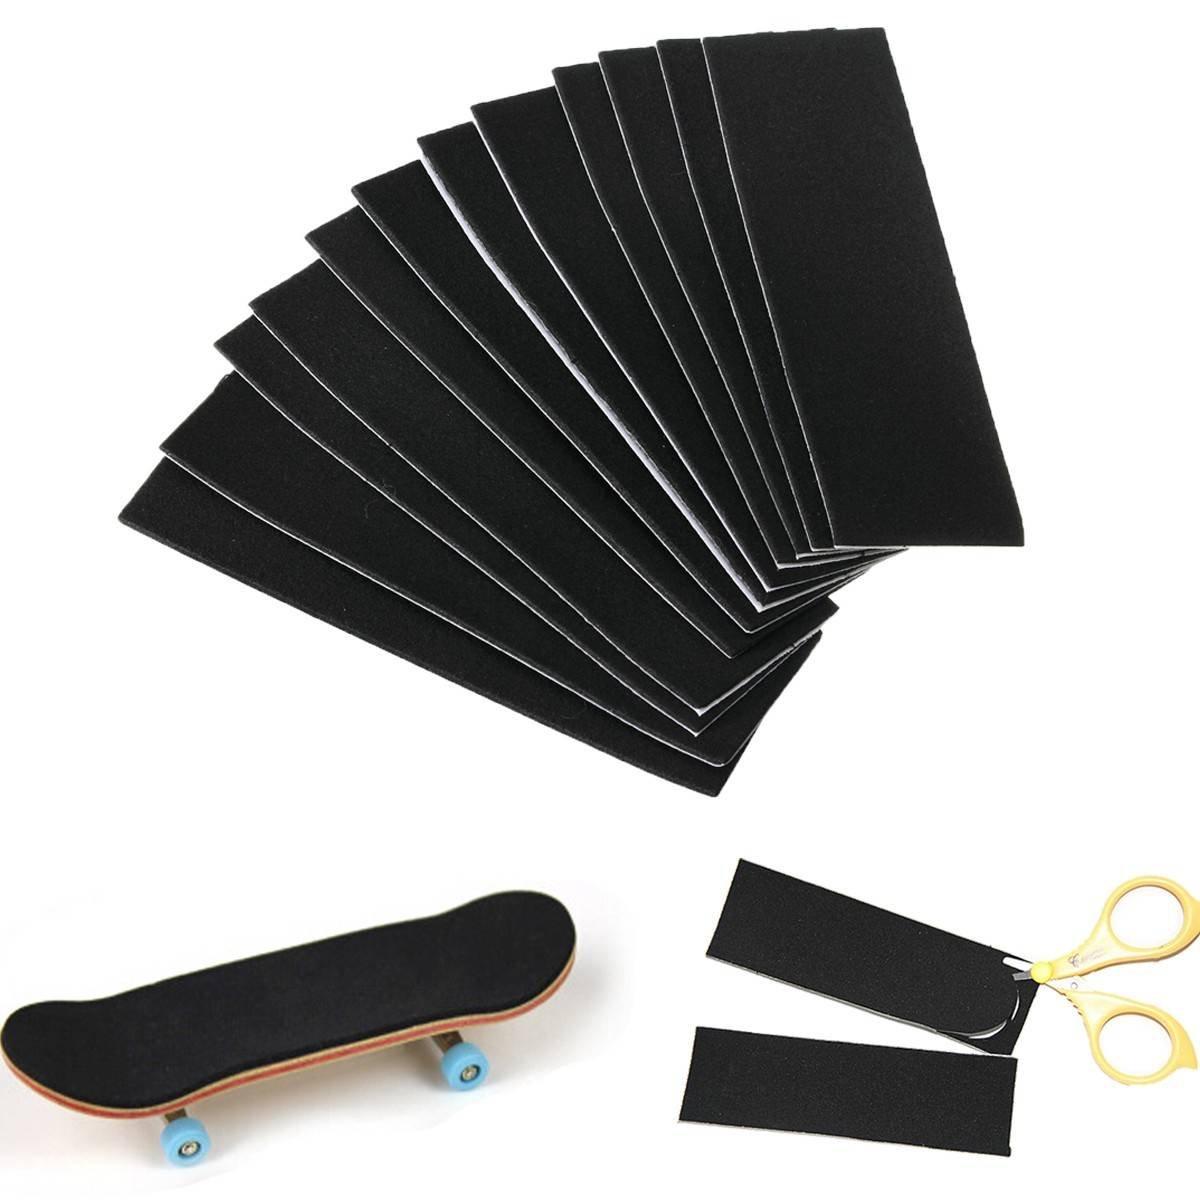 Bones Skate Bearings Cleaning Unit … (Bones Maintenance